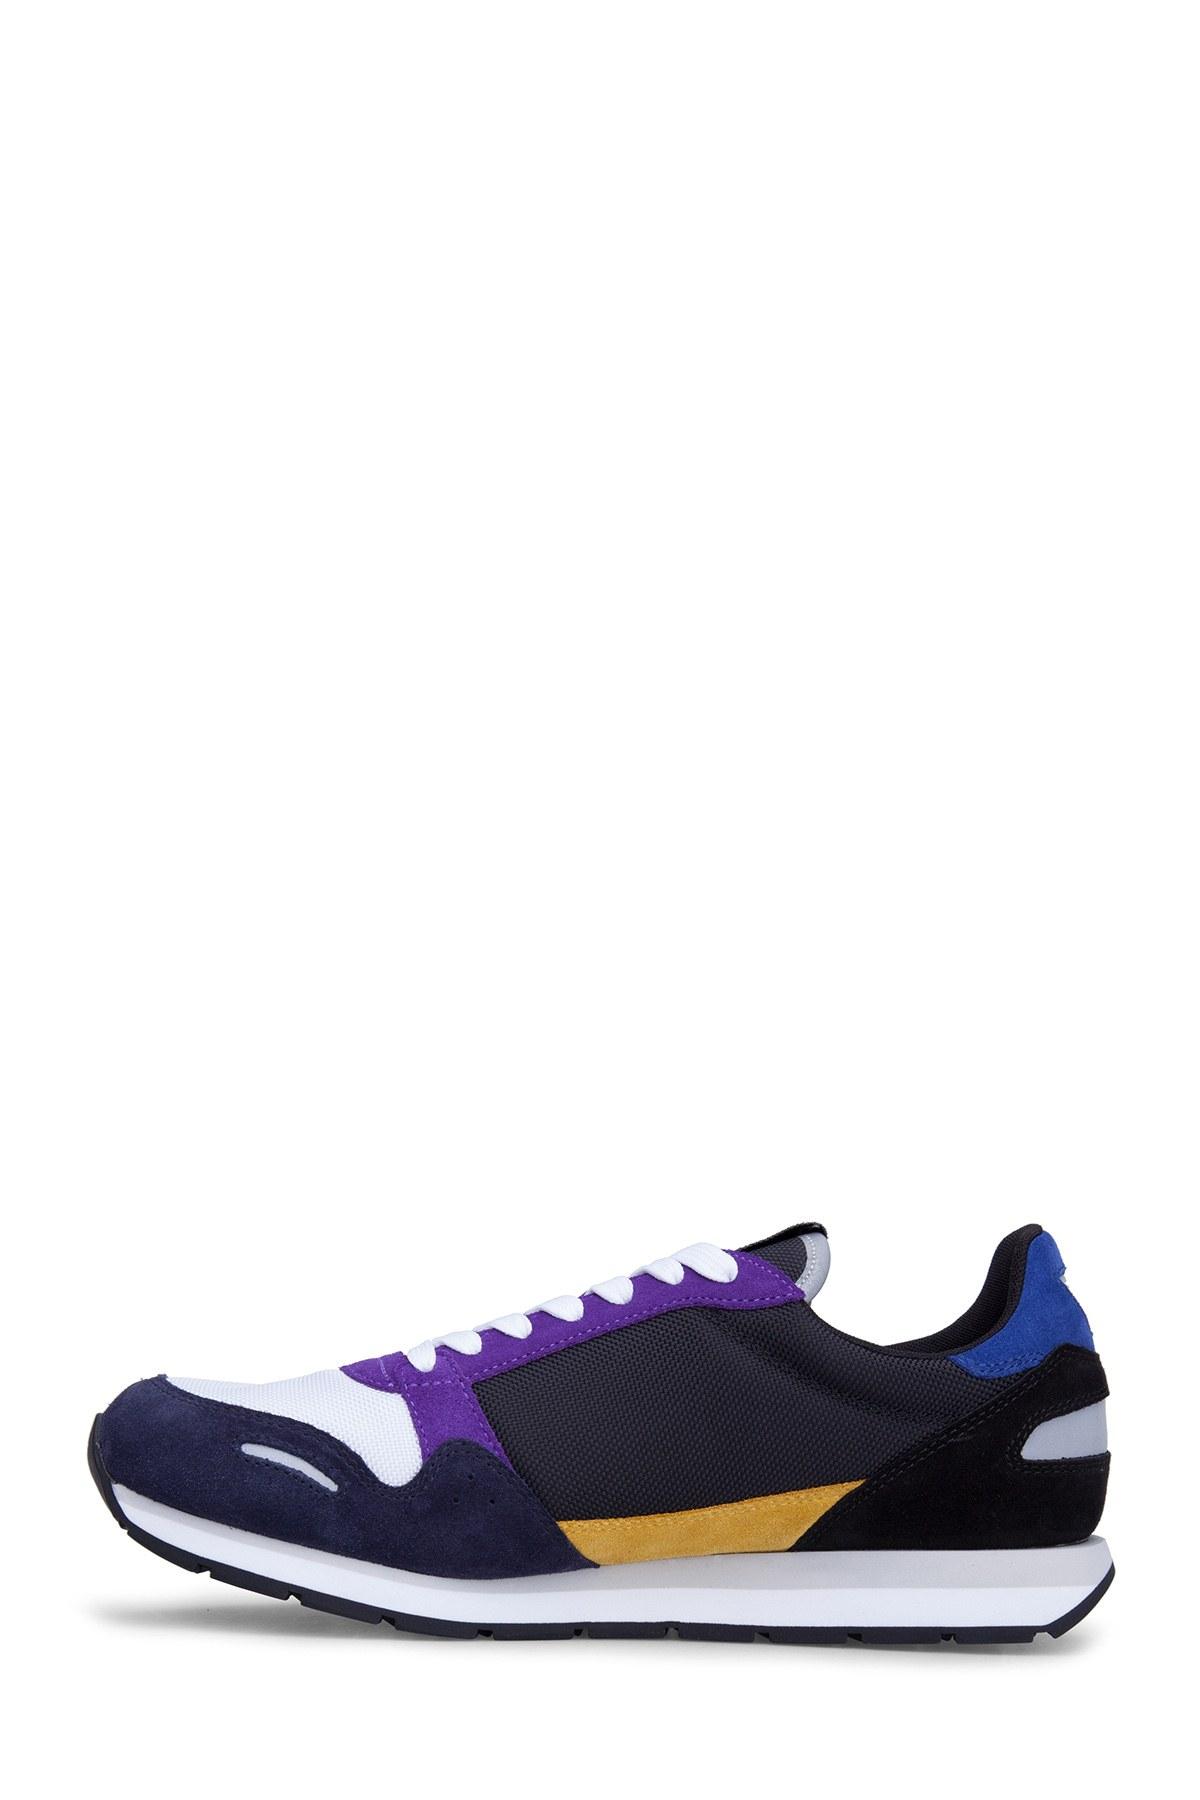 Emporio Armani Erkek Ayakkabı S X4X215 XL200 A007 MOR